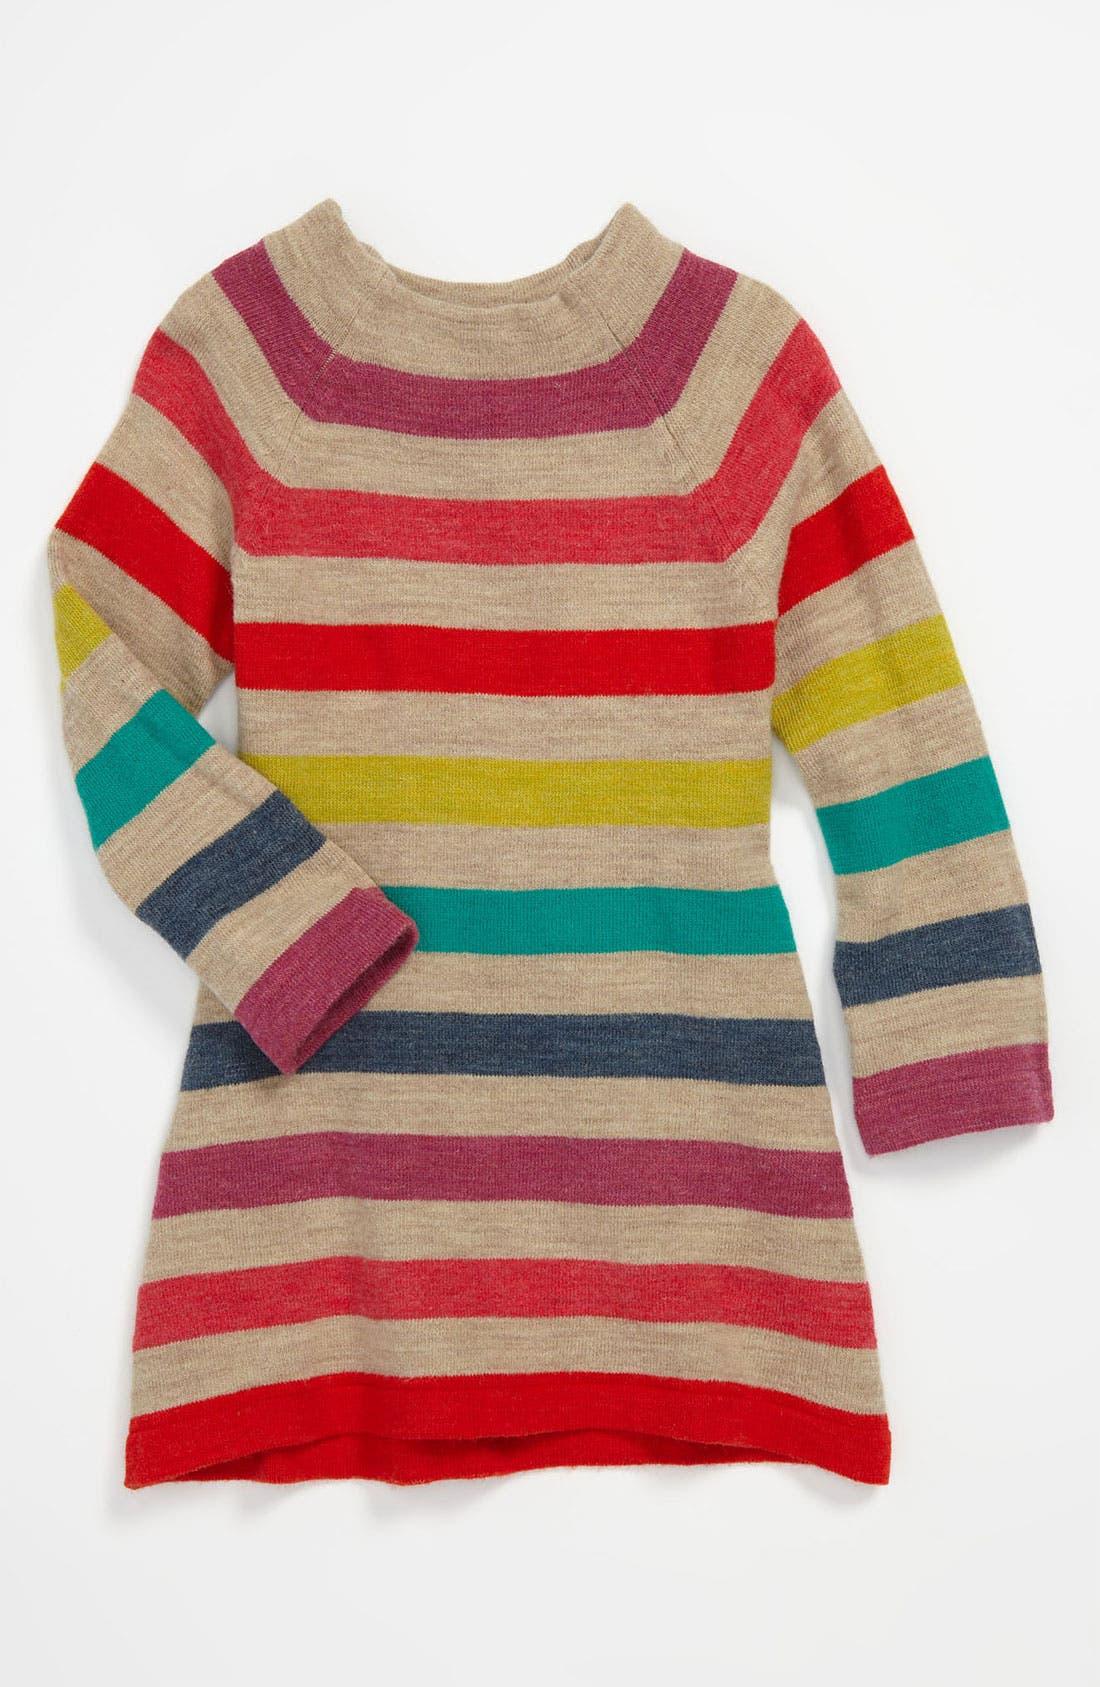 Alternate Image 1 Selected - United Colors of Benetton Kids Stripe Knit Dress (Infant)